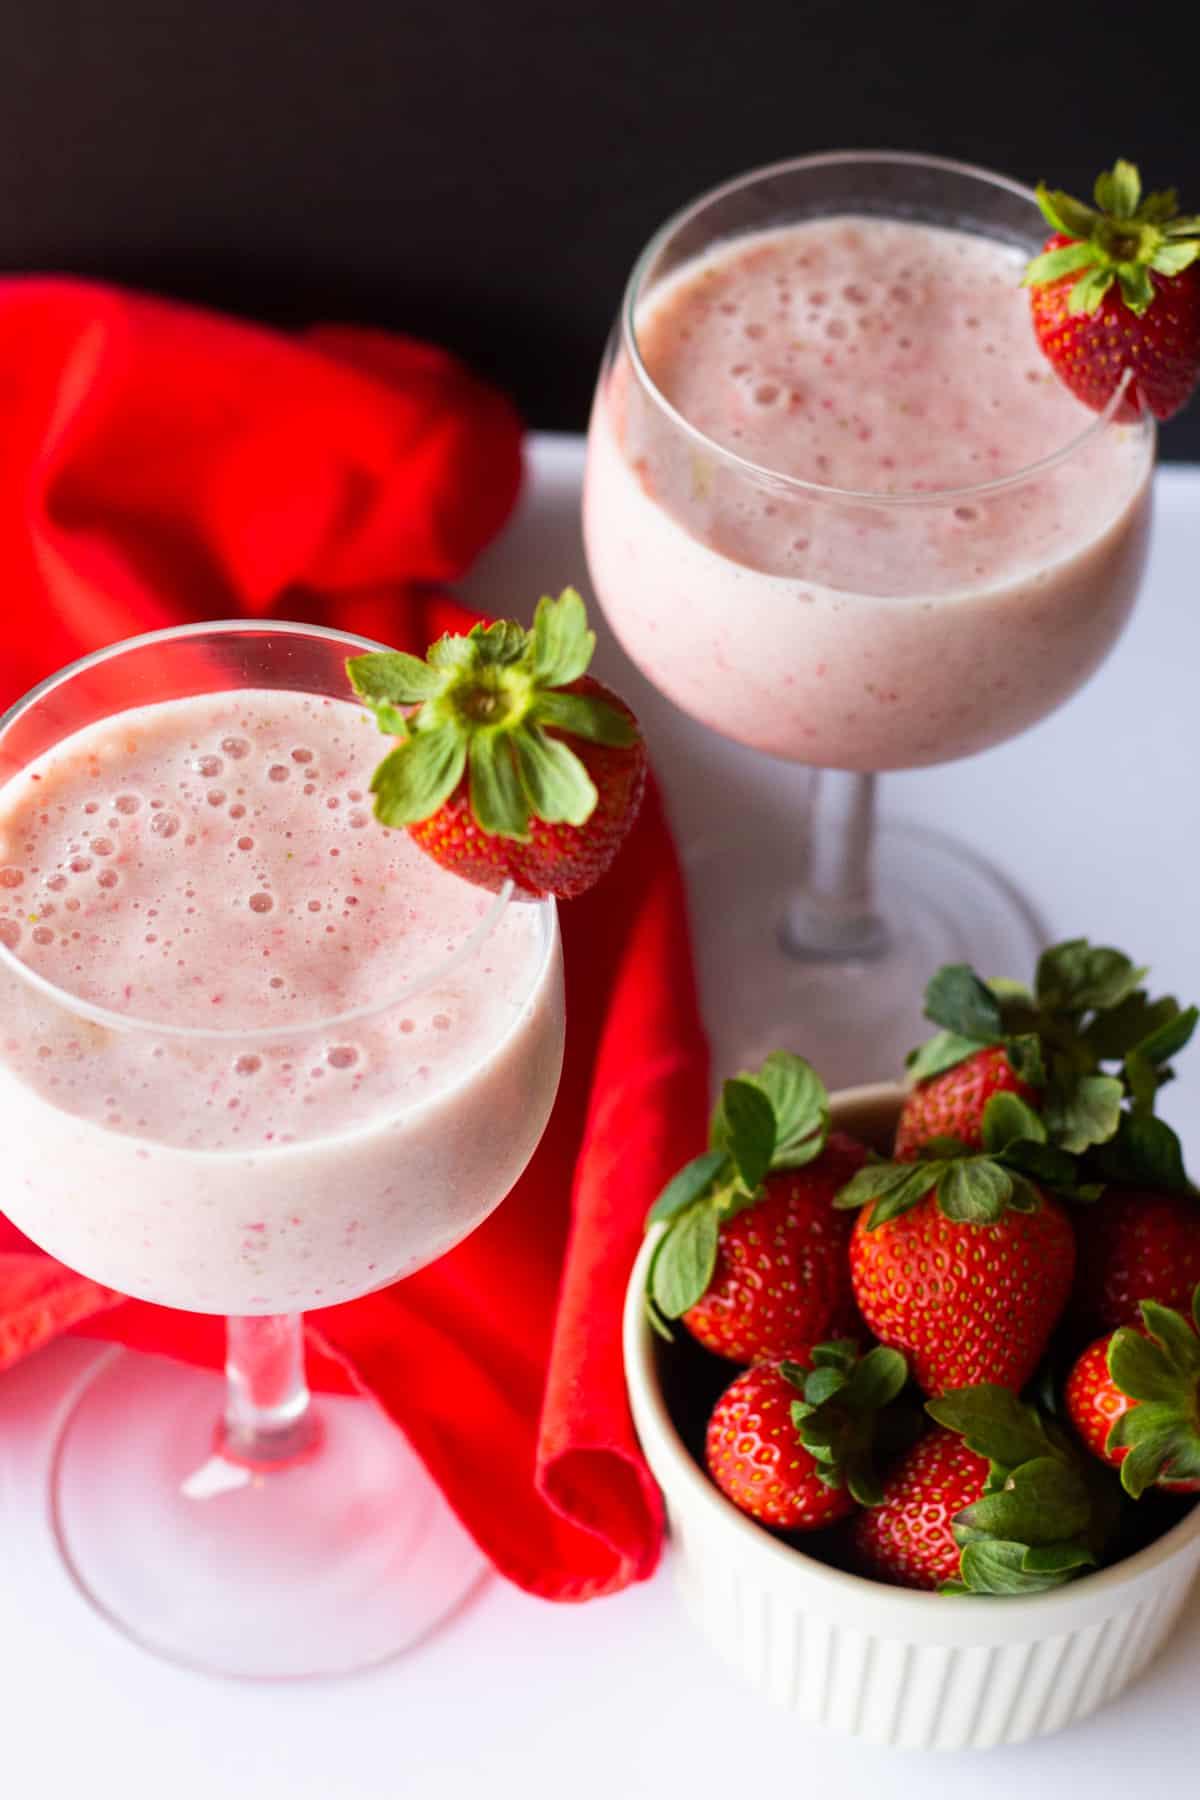 healthy strawberry milkshake recipe is made with fresh strawberries and bananas.